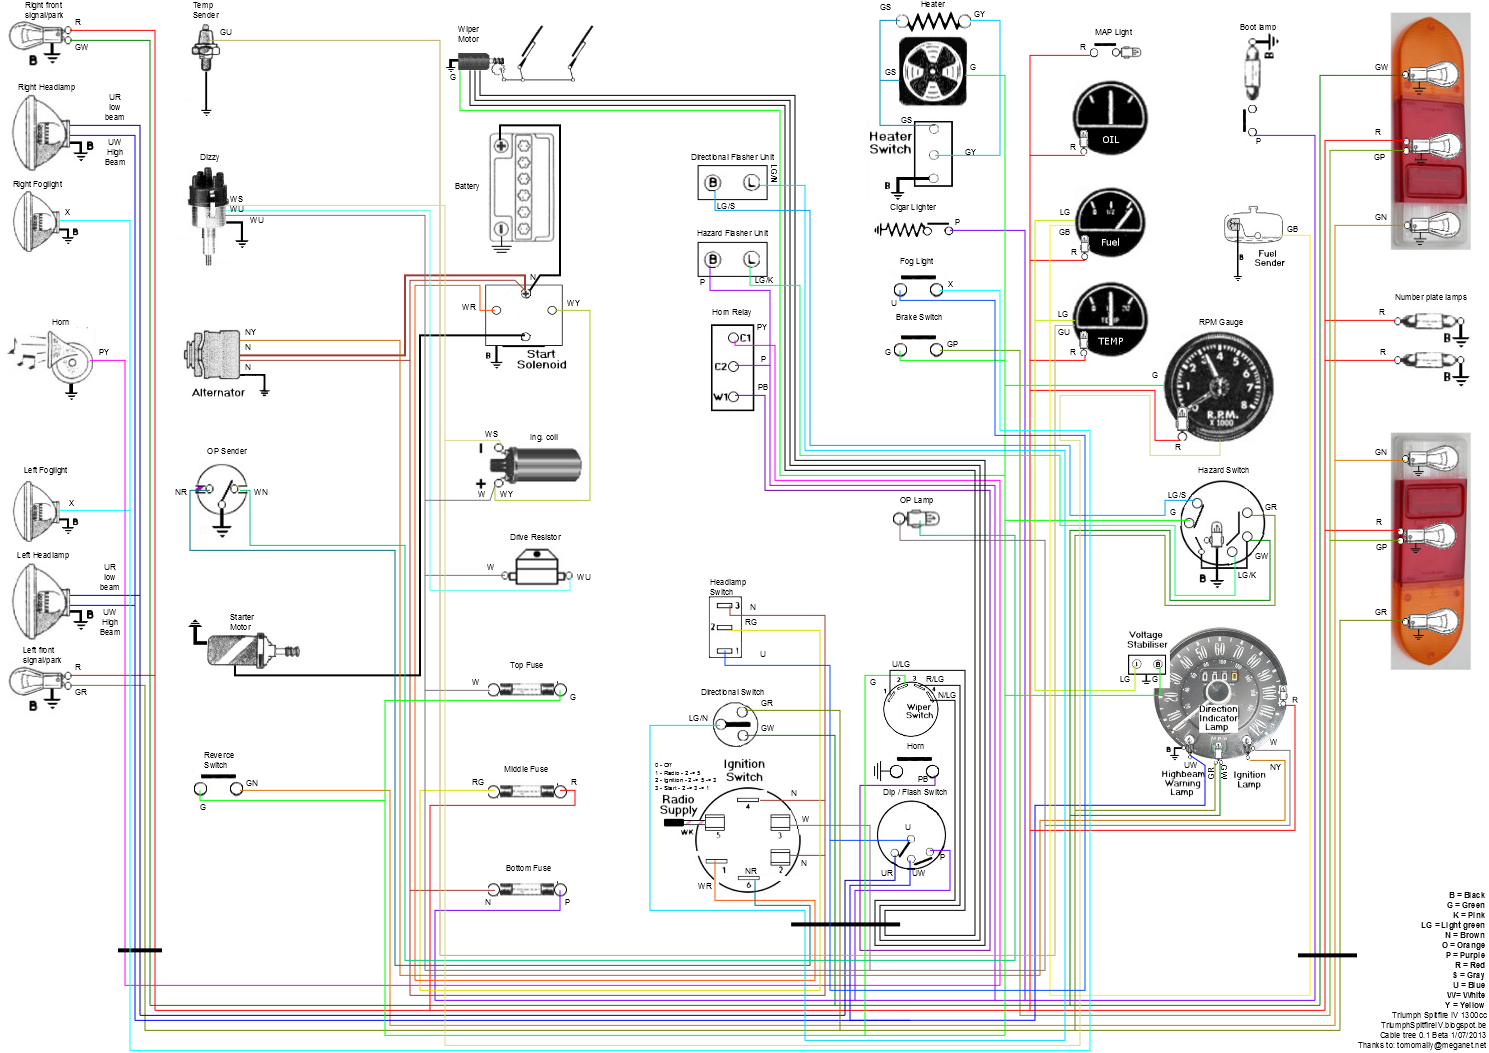 Triumph Tr6 Wiring Diagram - 2010 Xterra Engine Diagram for Wiring Diagram  SchematicsWiring Diagram Schematics